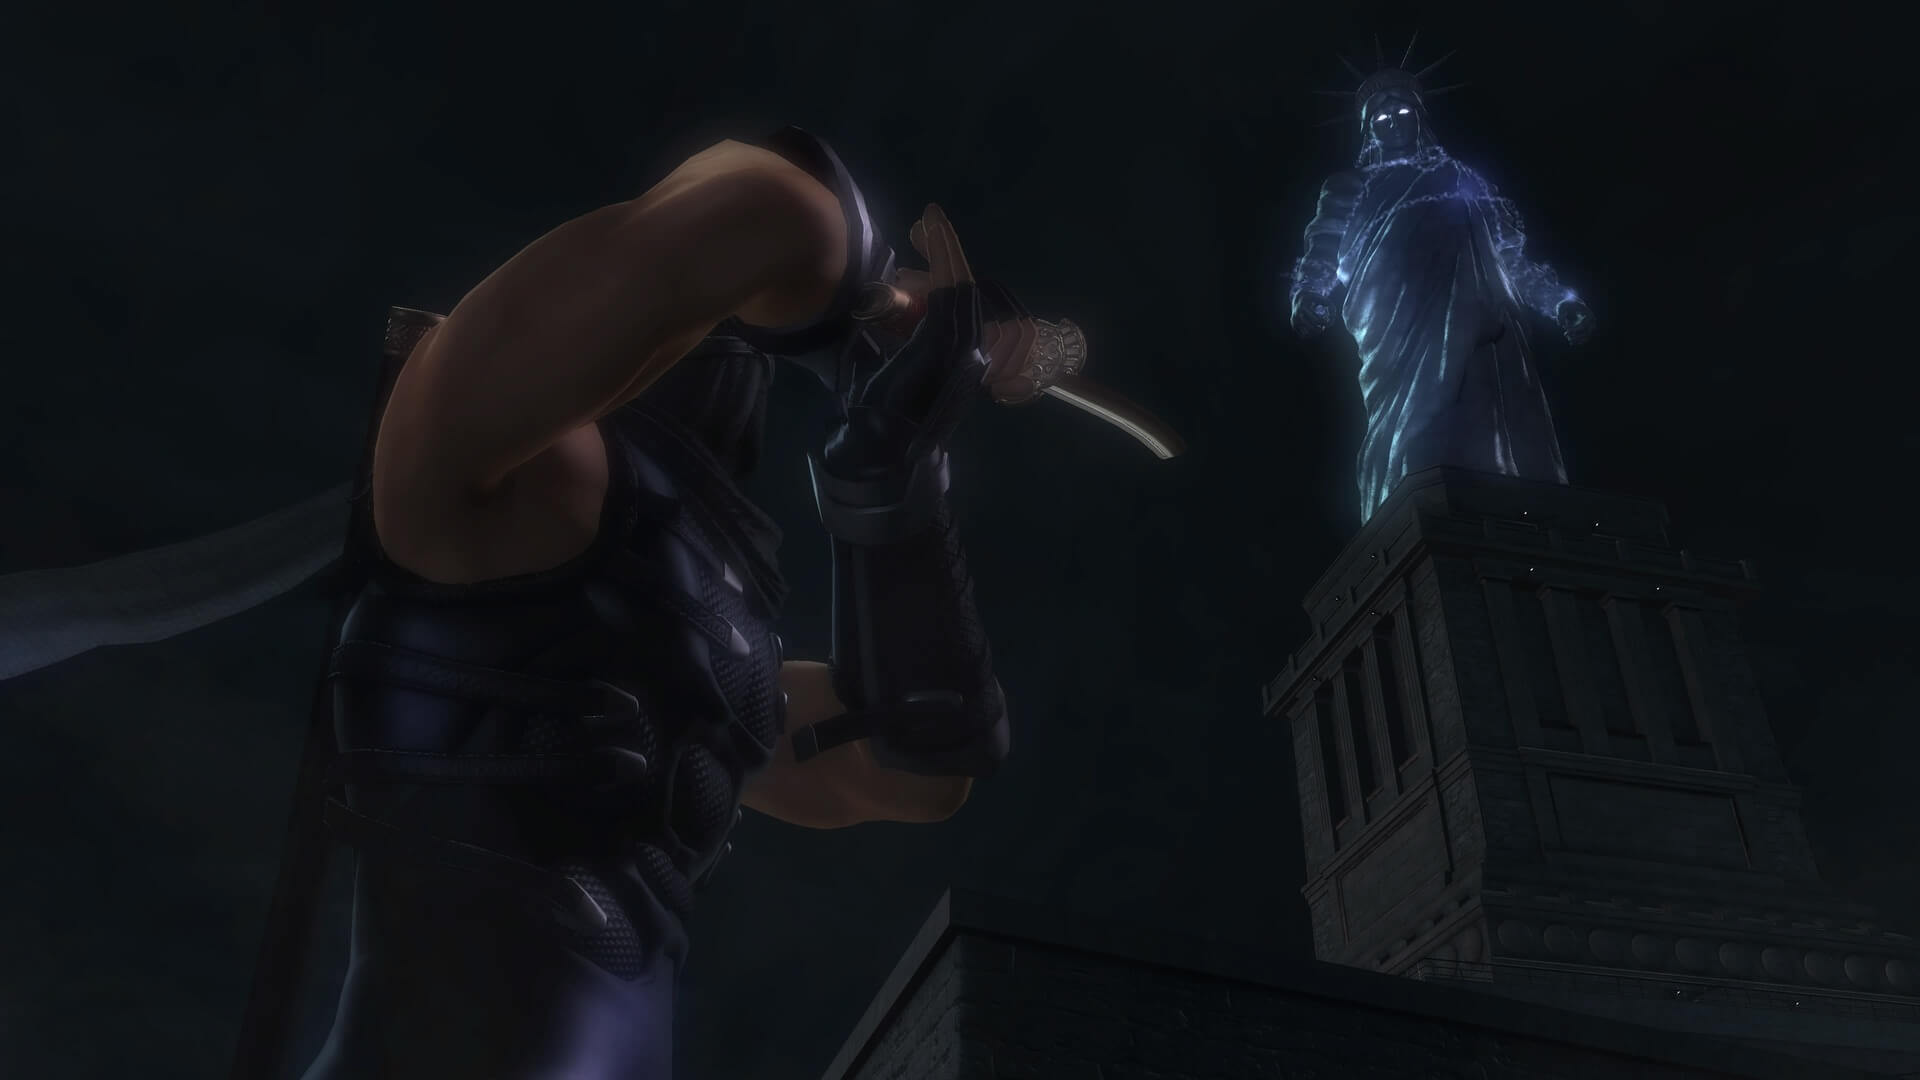 Ninja Gaiden Sigma 2, Ninja Gaiden, Cabeça Fria, Delfos, Koei Tecmo, Team Ninja